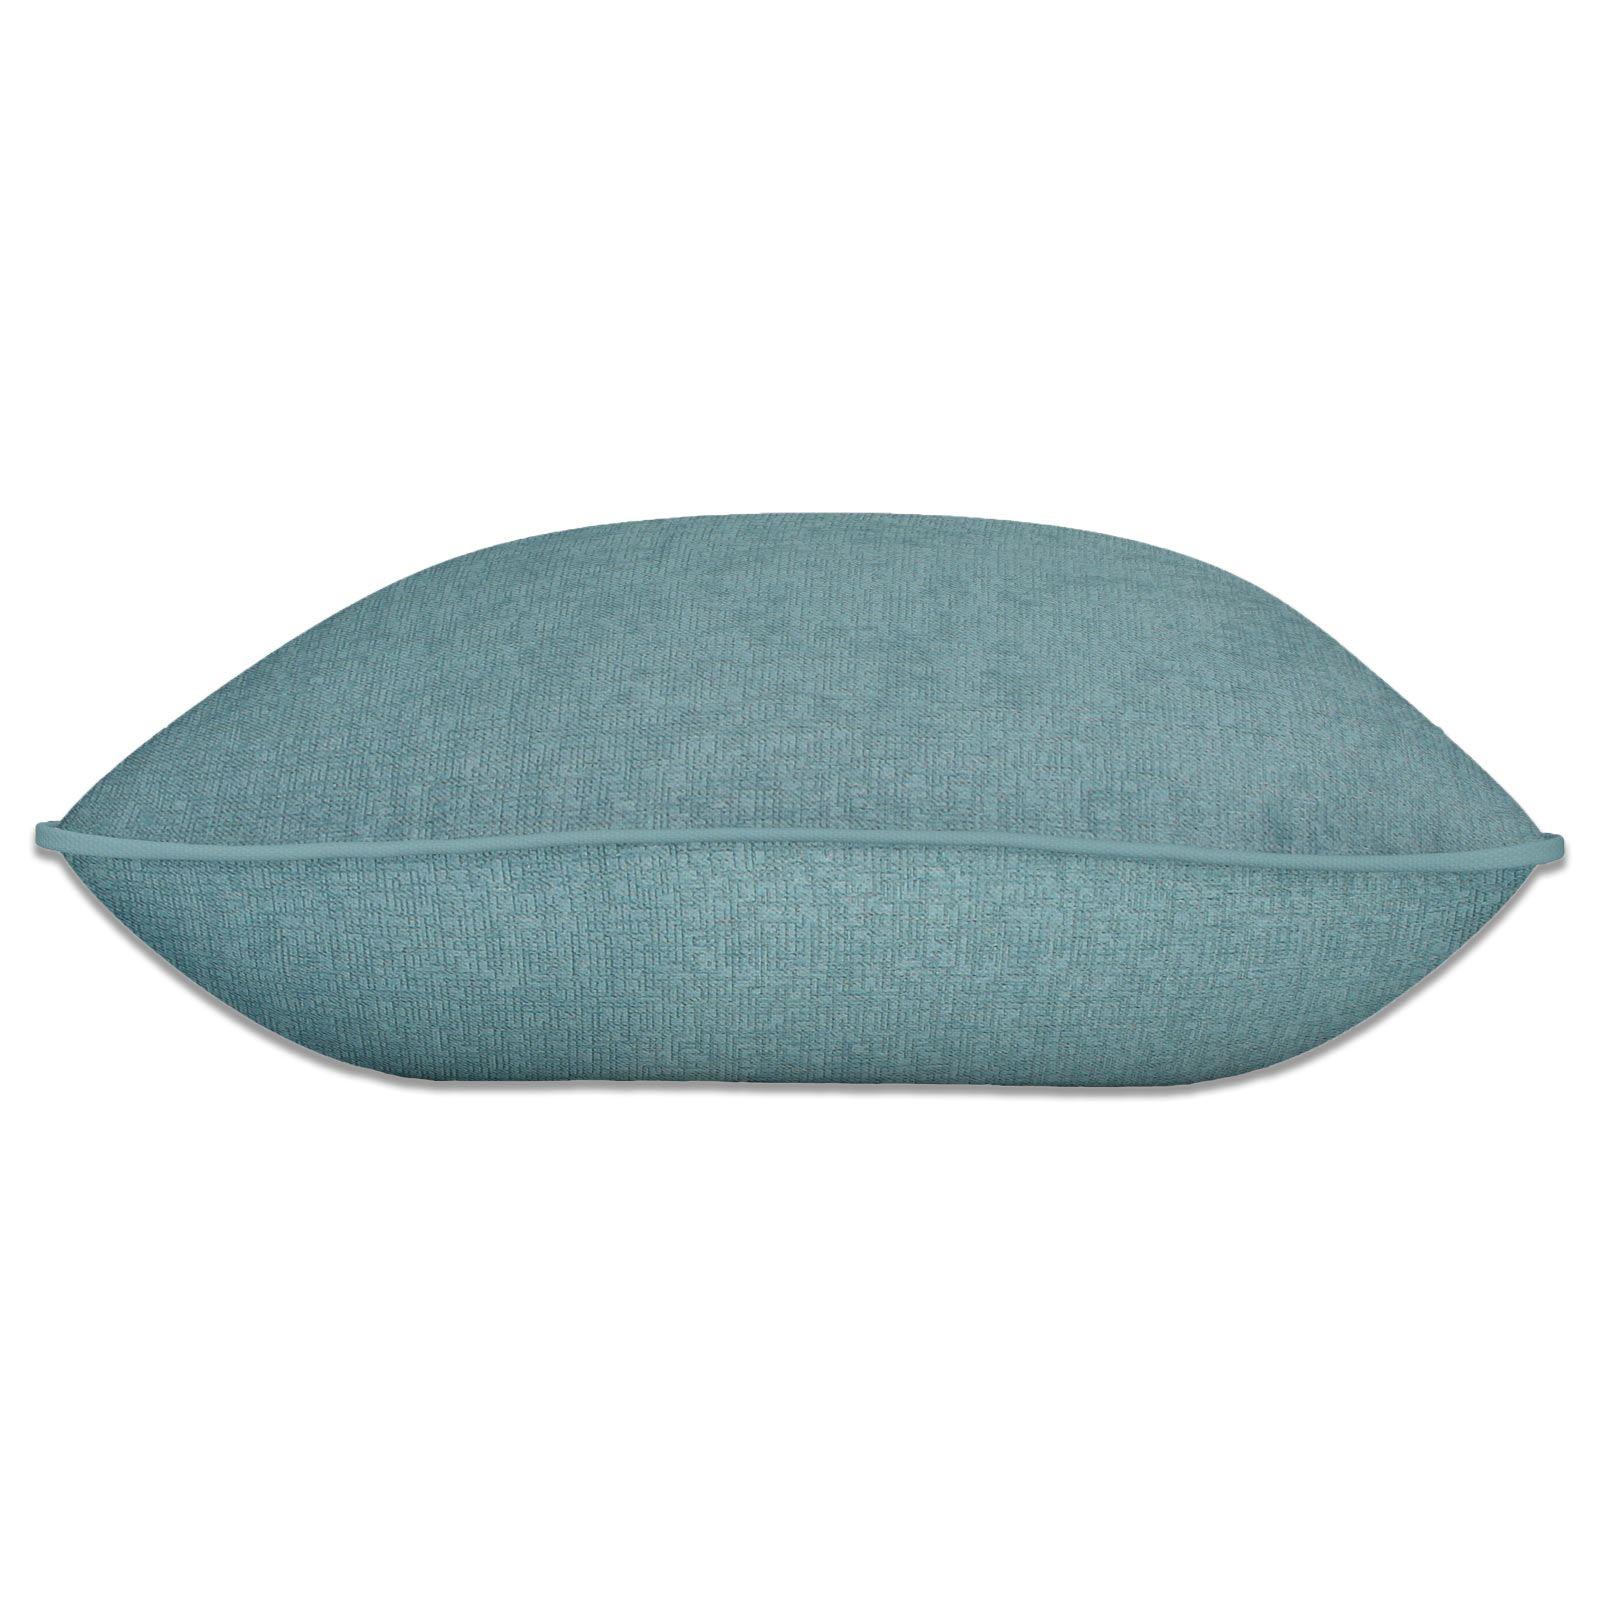 Teal-Blue-Duck-Egg-Cushion-Covers-18-034-x18-034-45cm-x-45cm-Luxury-Cover thumbnail 9